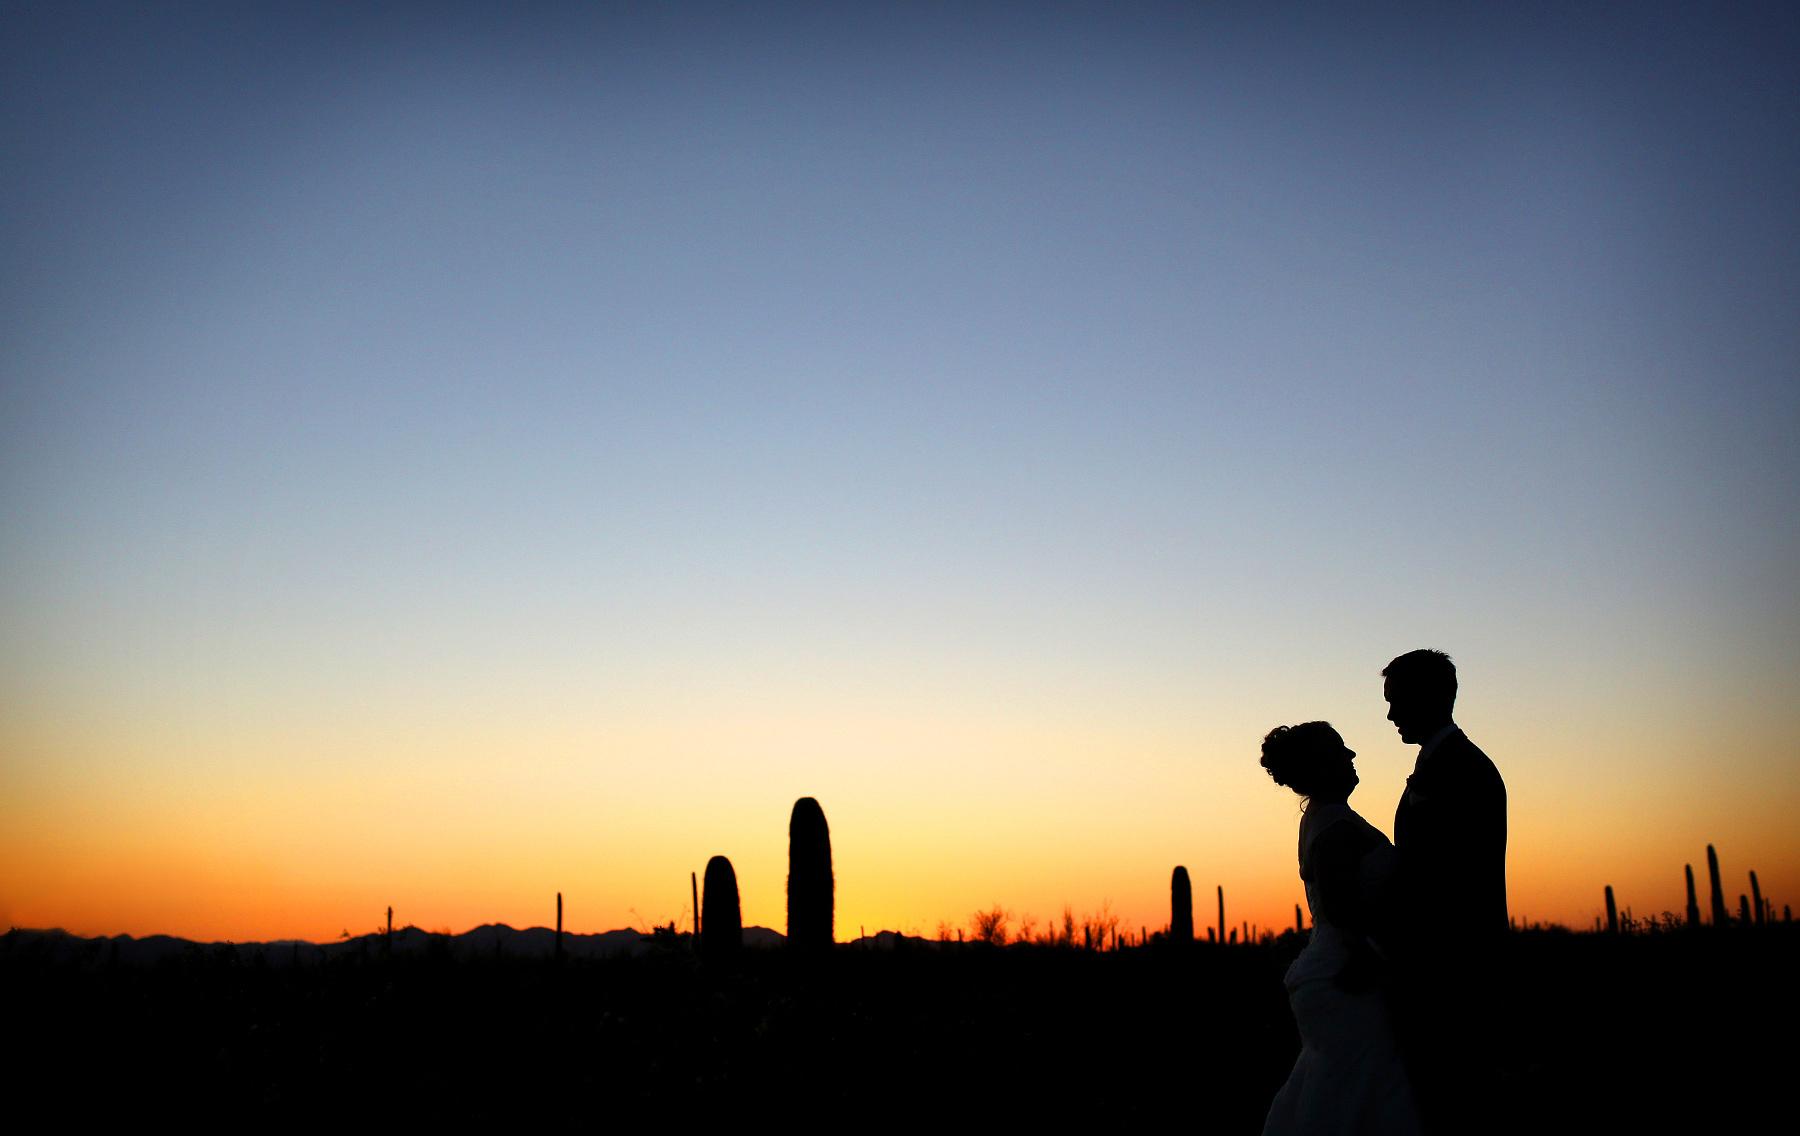 13-Tuscan-Arizona-Wedding-Photography-by-Vick-Photography-Destination-Wedding-Desert-Old-Tucson-Studios-Cactus-Sunset-Night-Photography-Elsa-and-Arthur.jpg